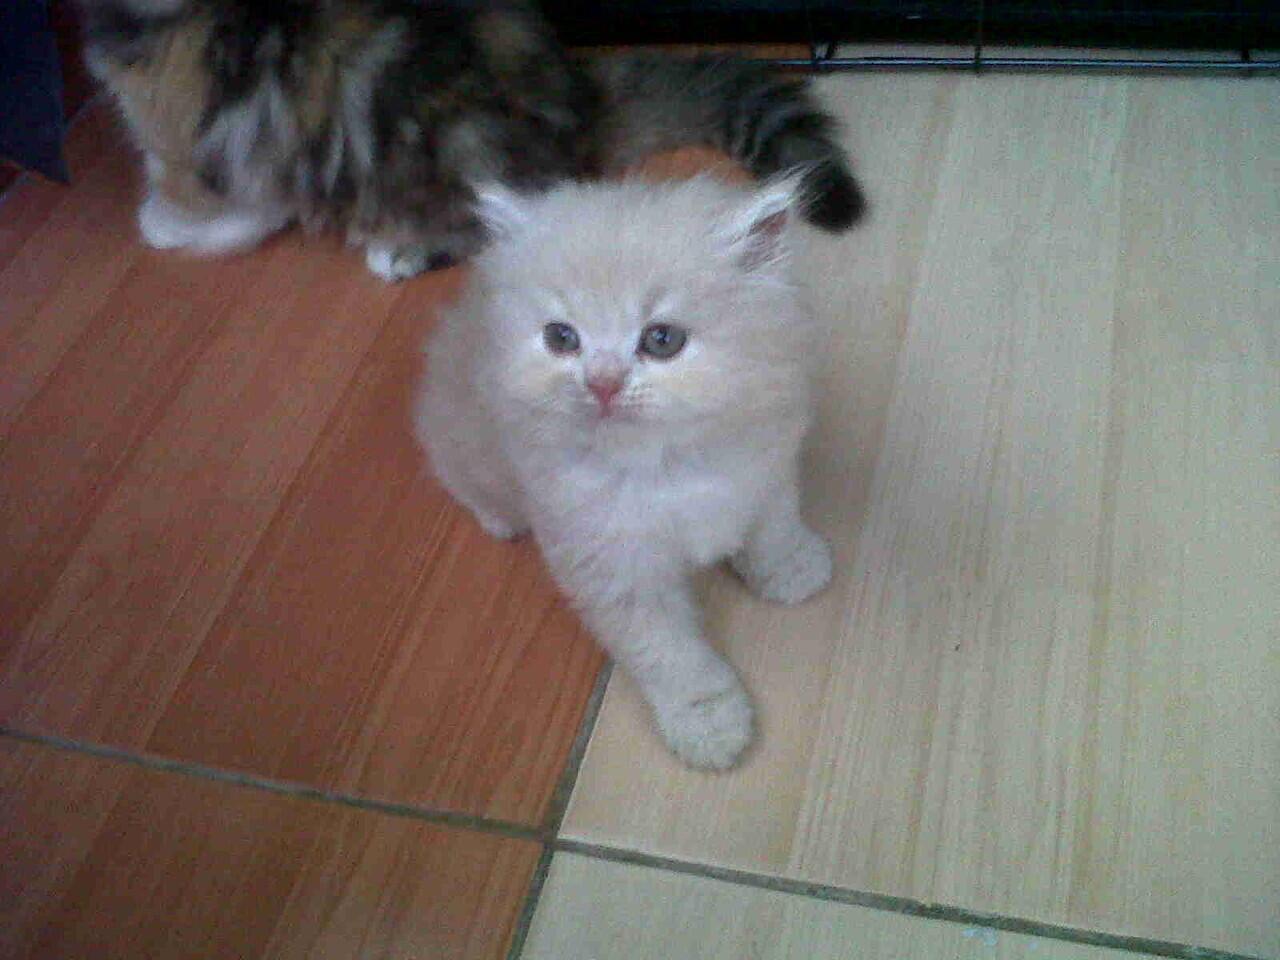 kucing persia kitten peliharaan rumah